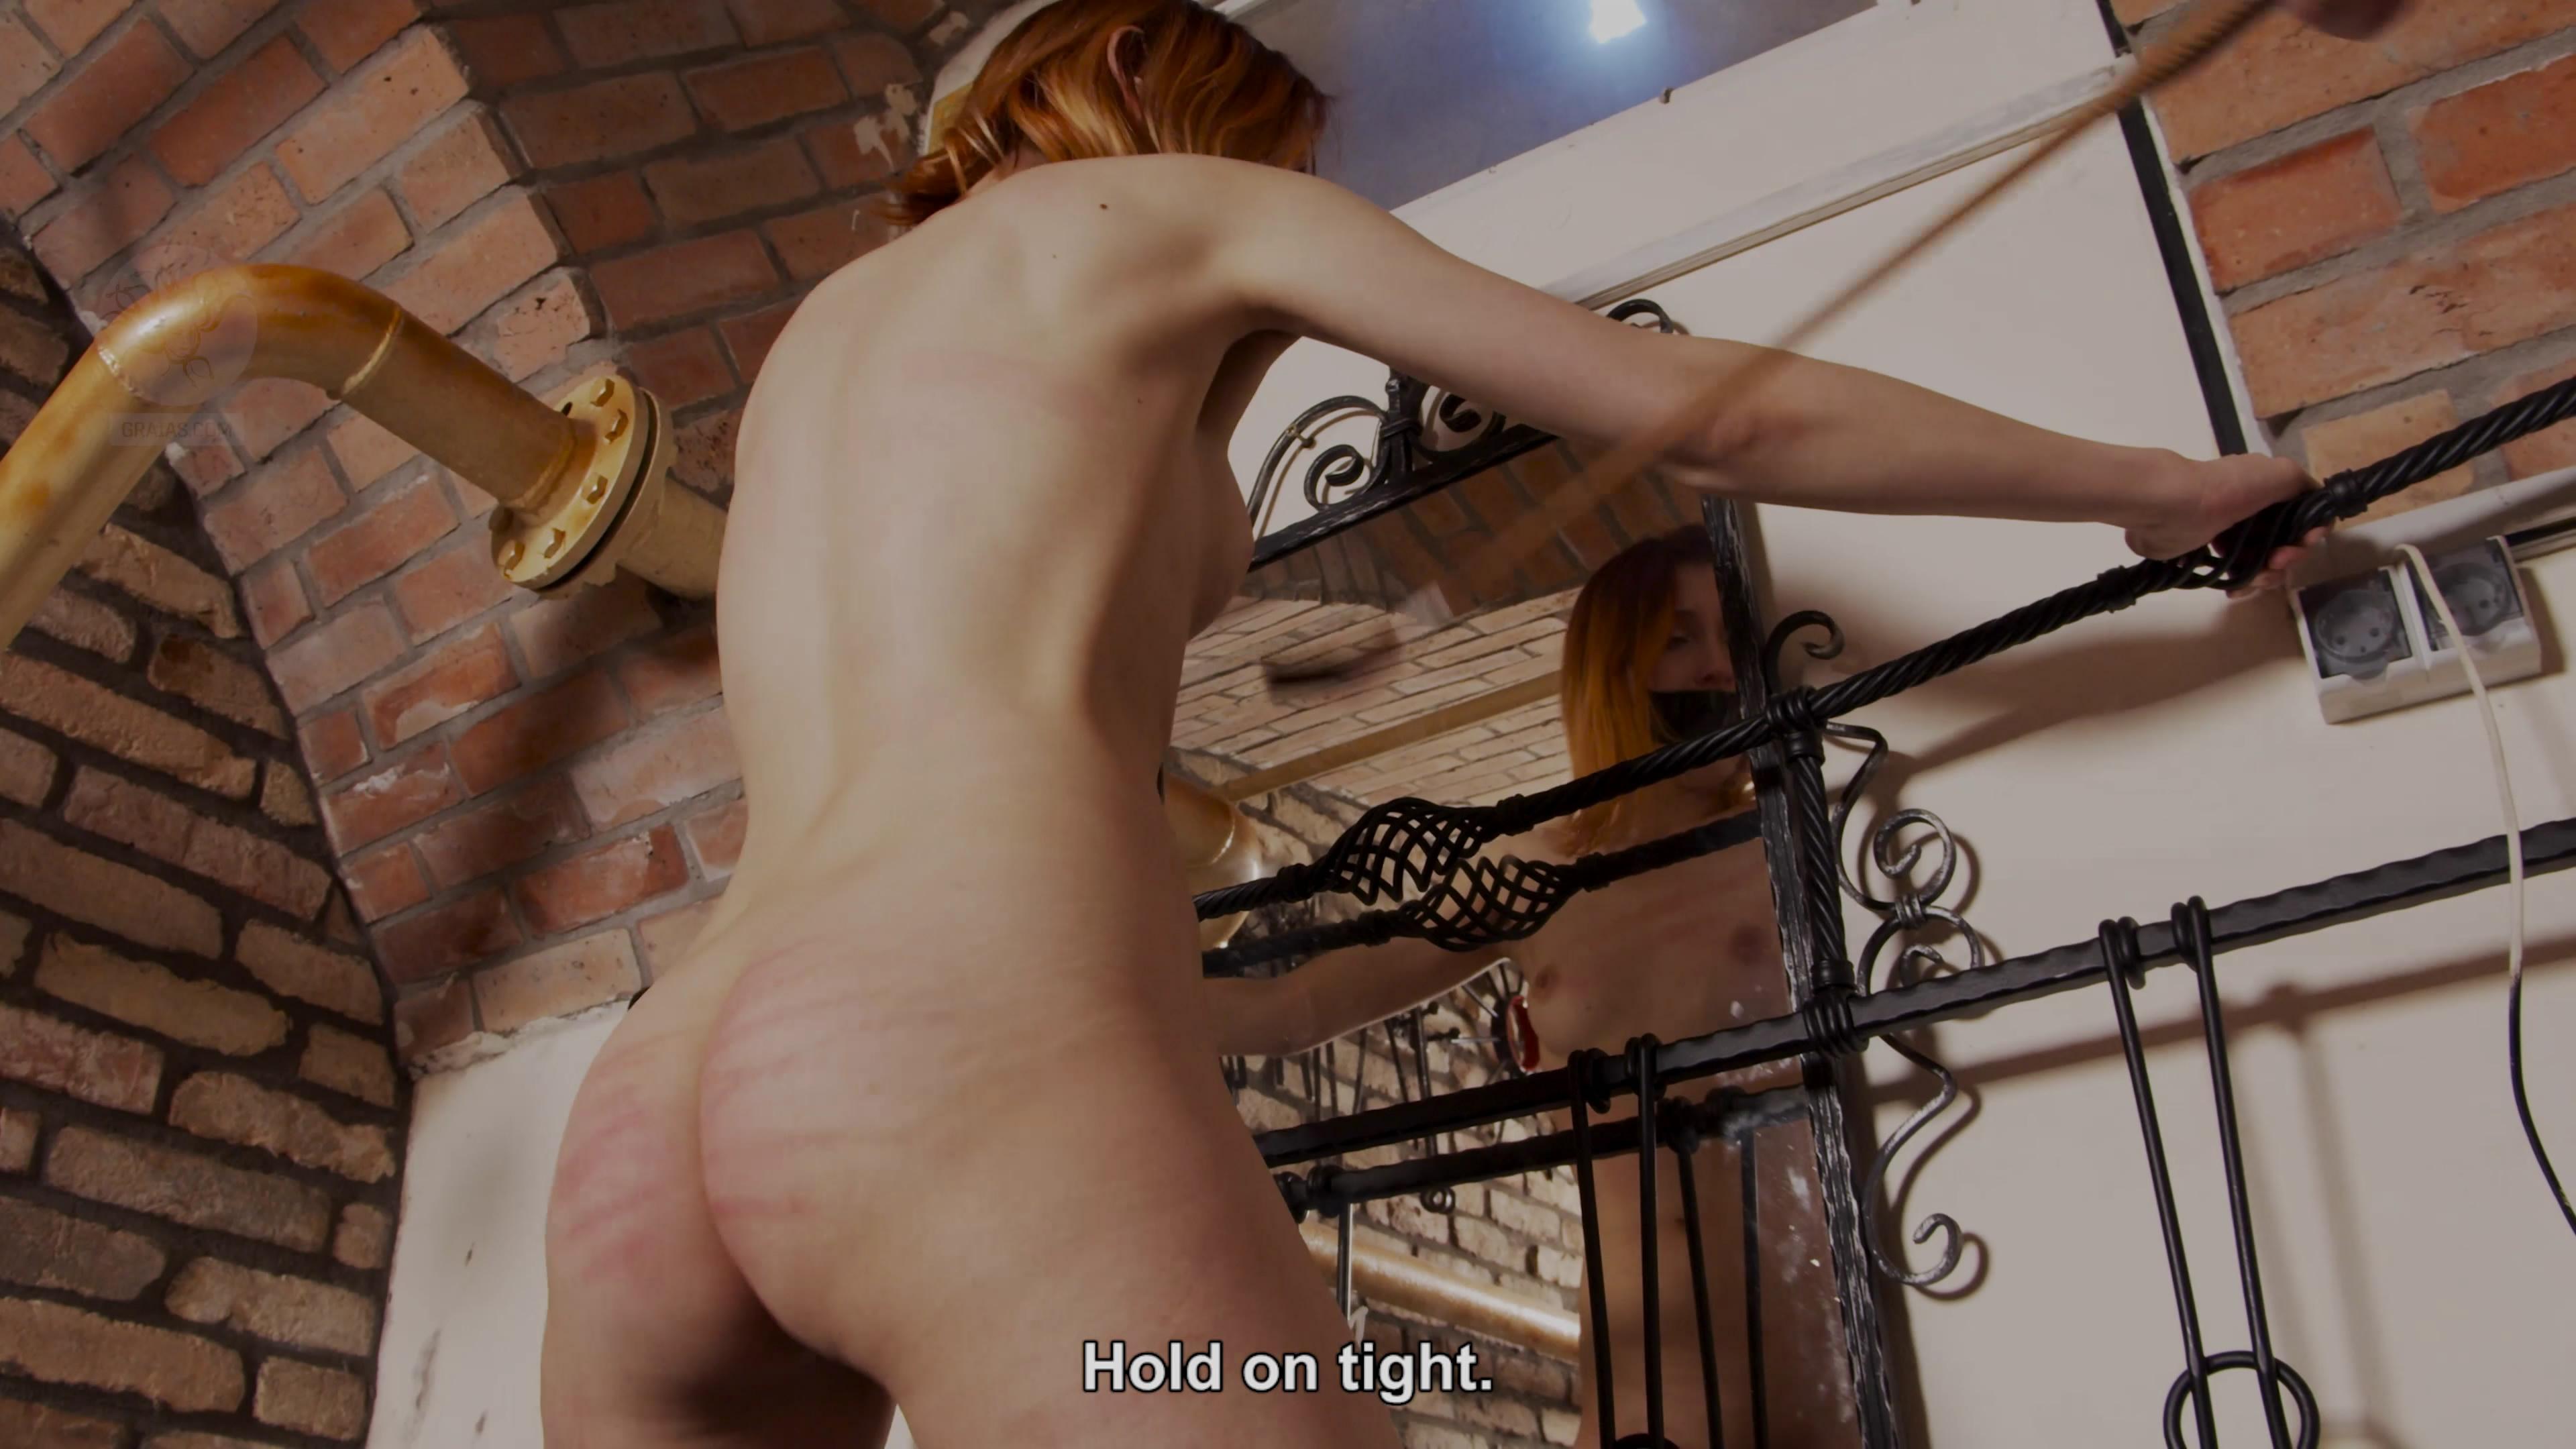 Graias – MP4/Ultra HD – NEW GIRL – ELIN FLAME – PART 2 (4K)